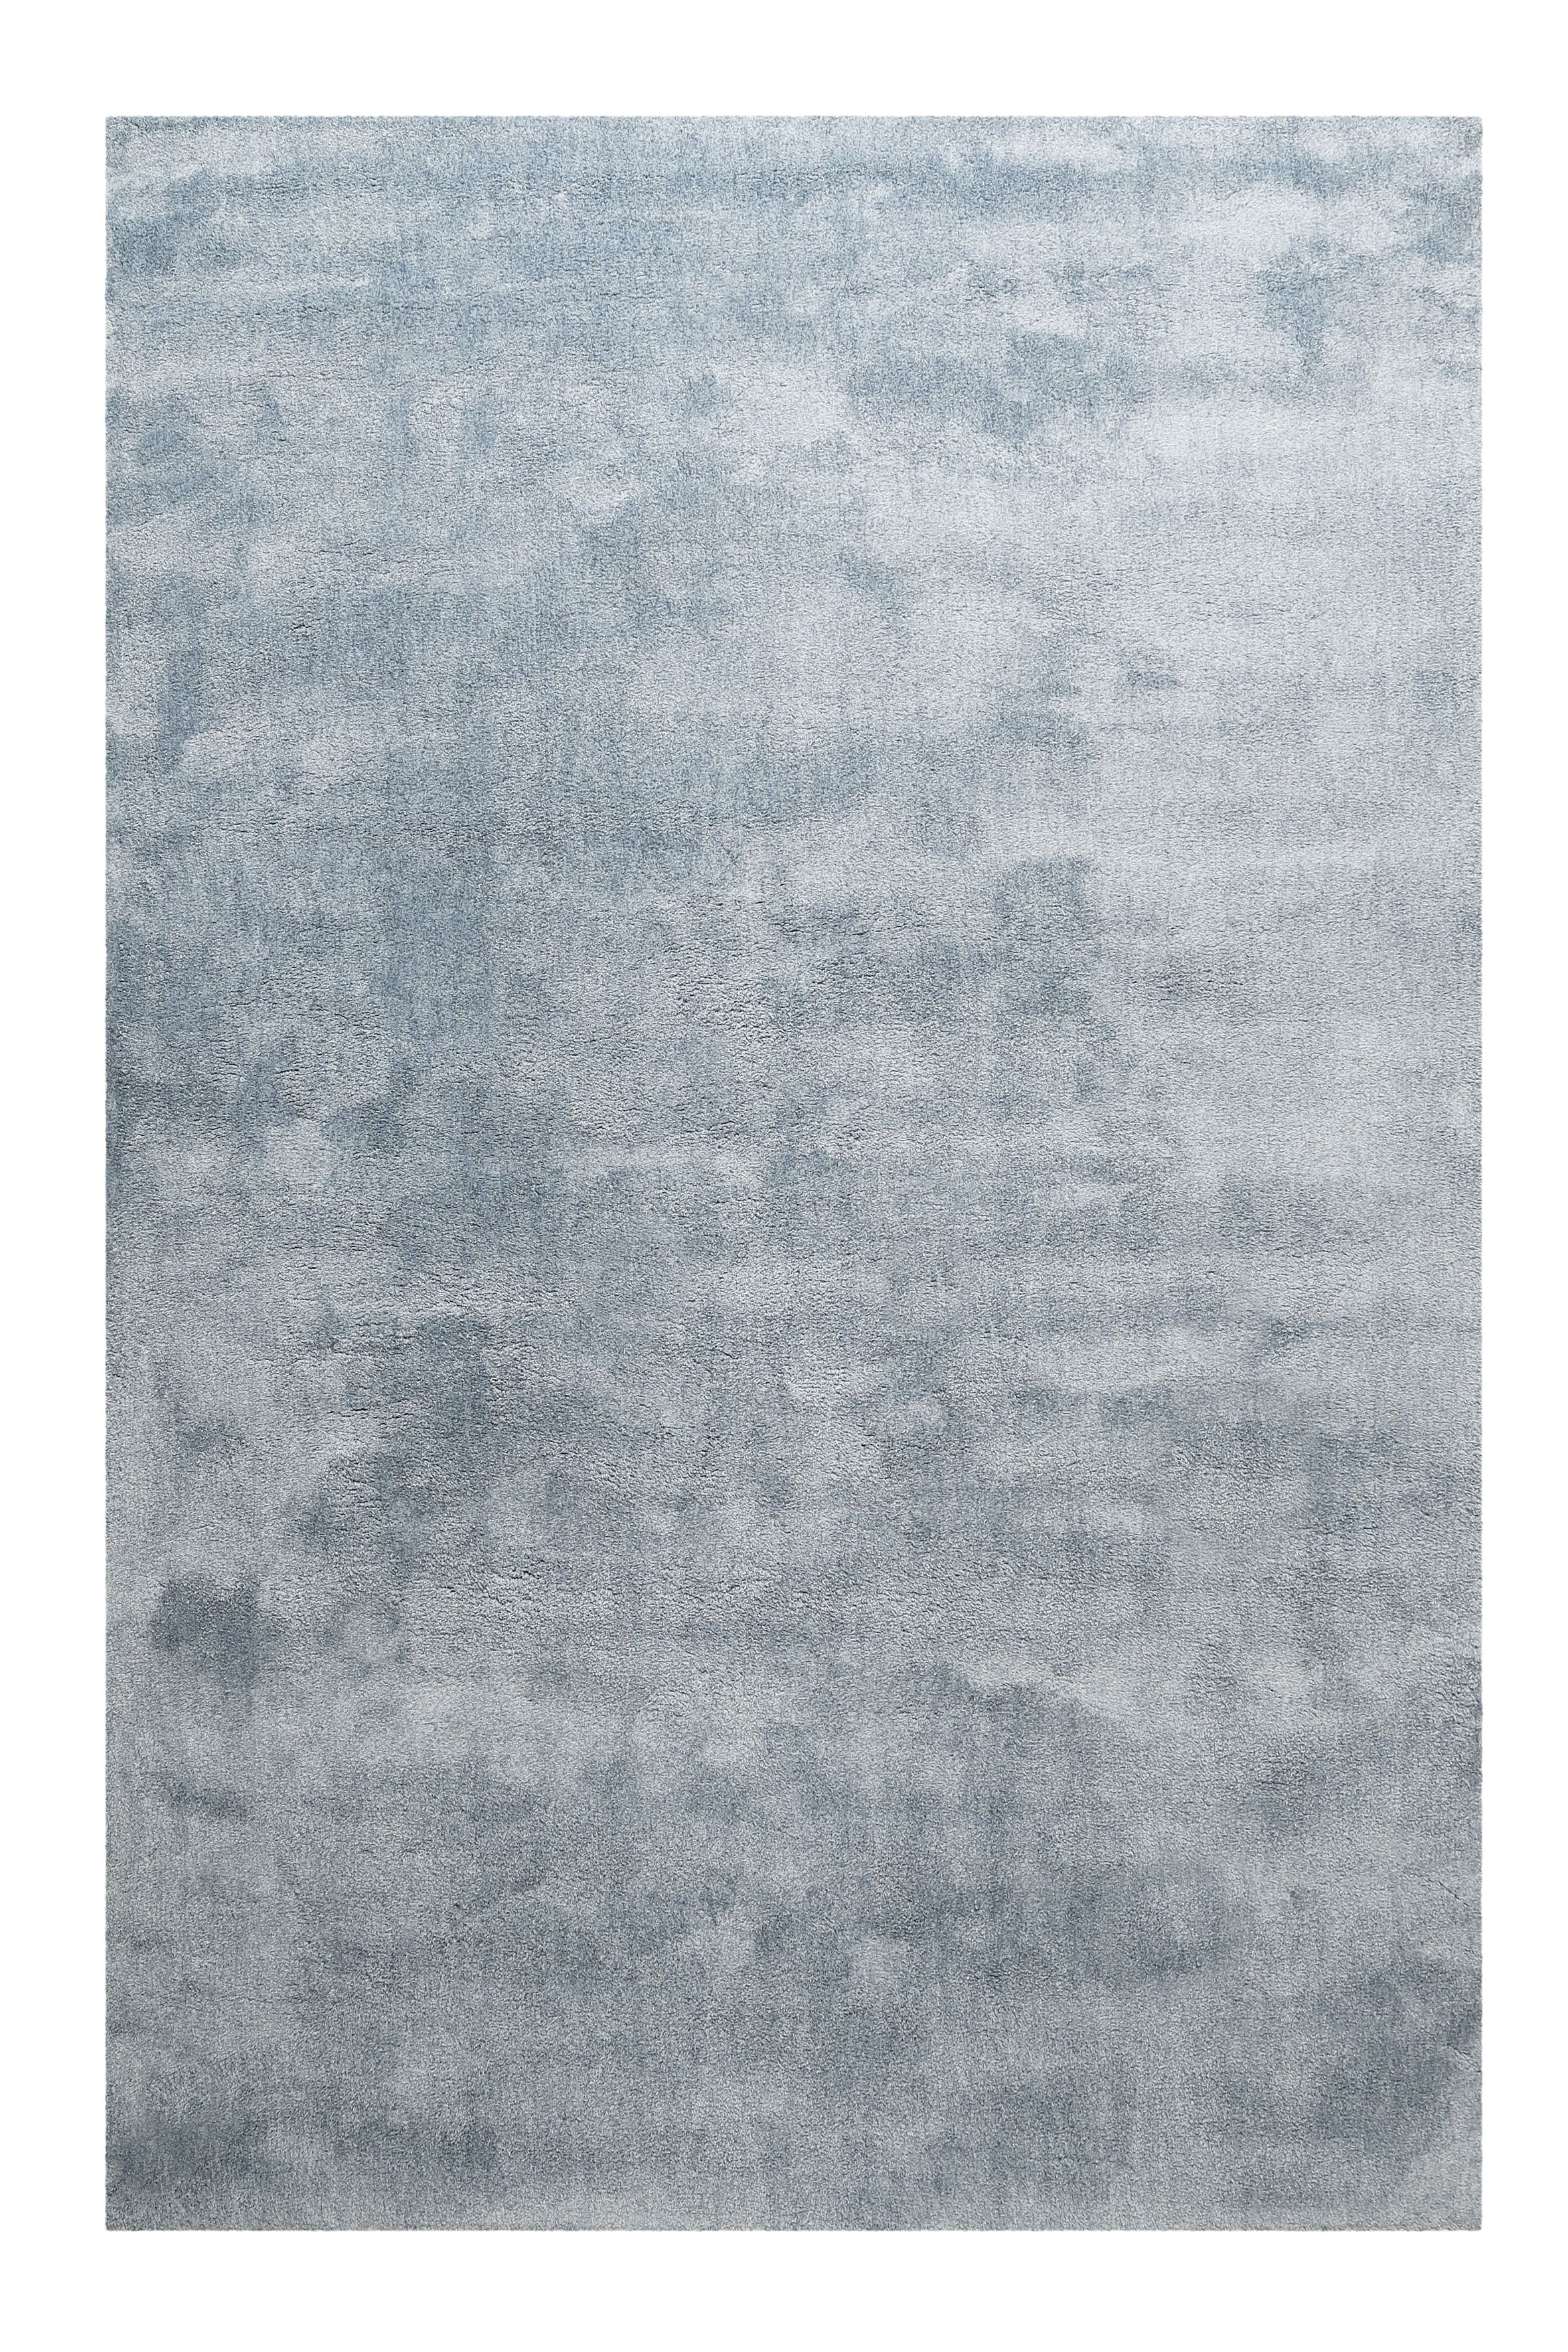 Homie Living Hochflor Teppich Sienna Blau Grau Salon